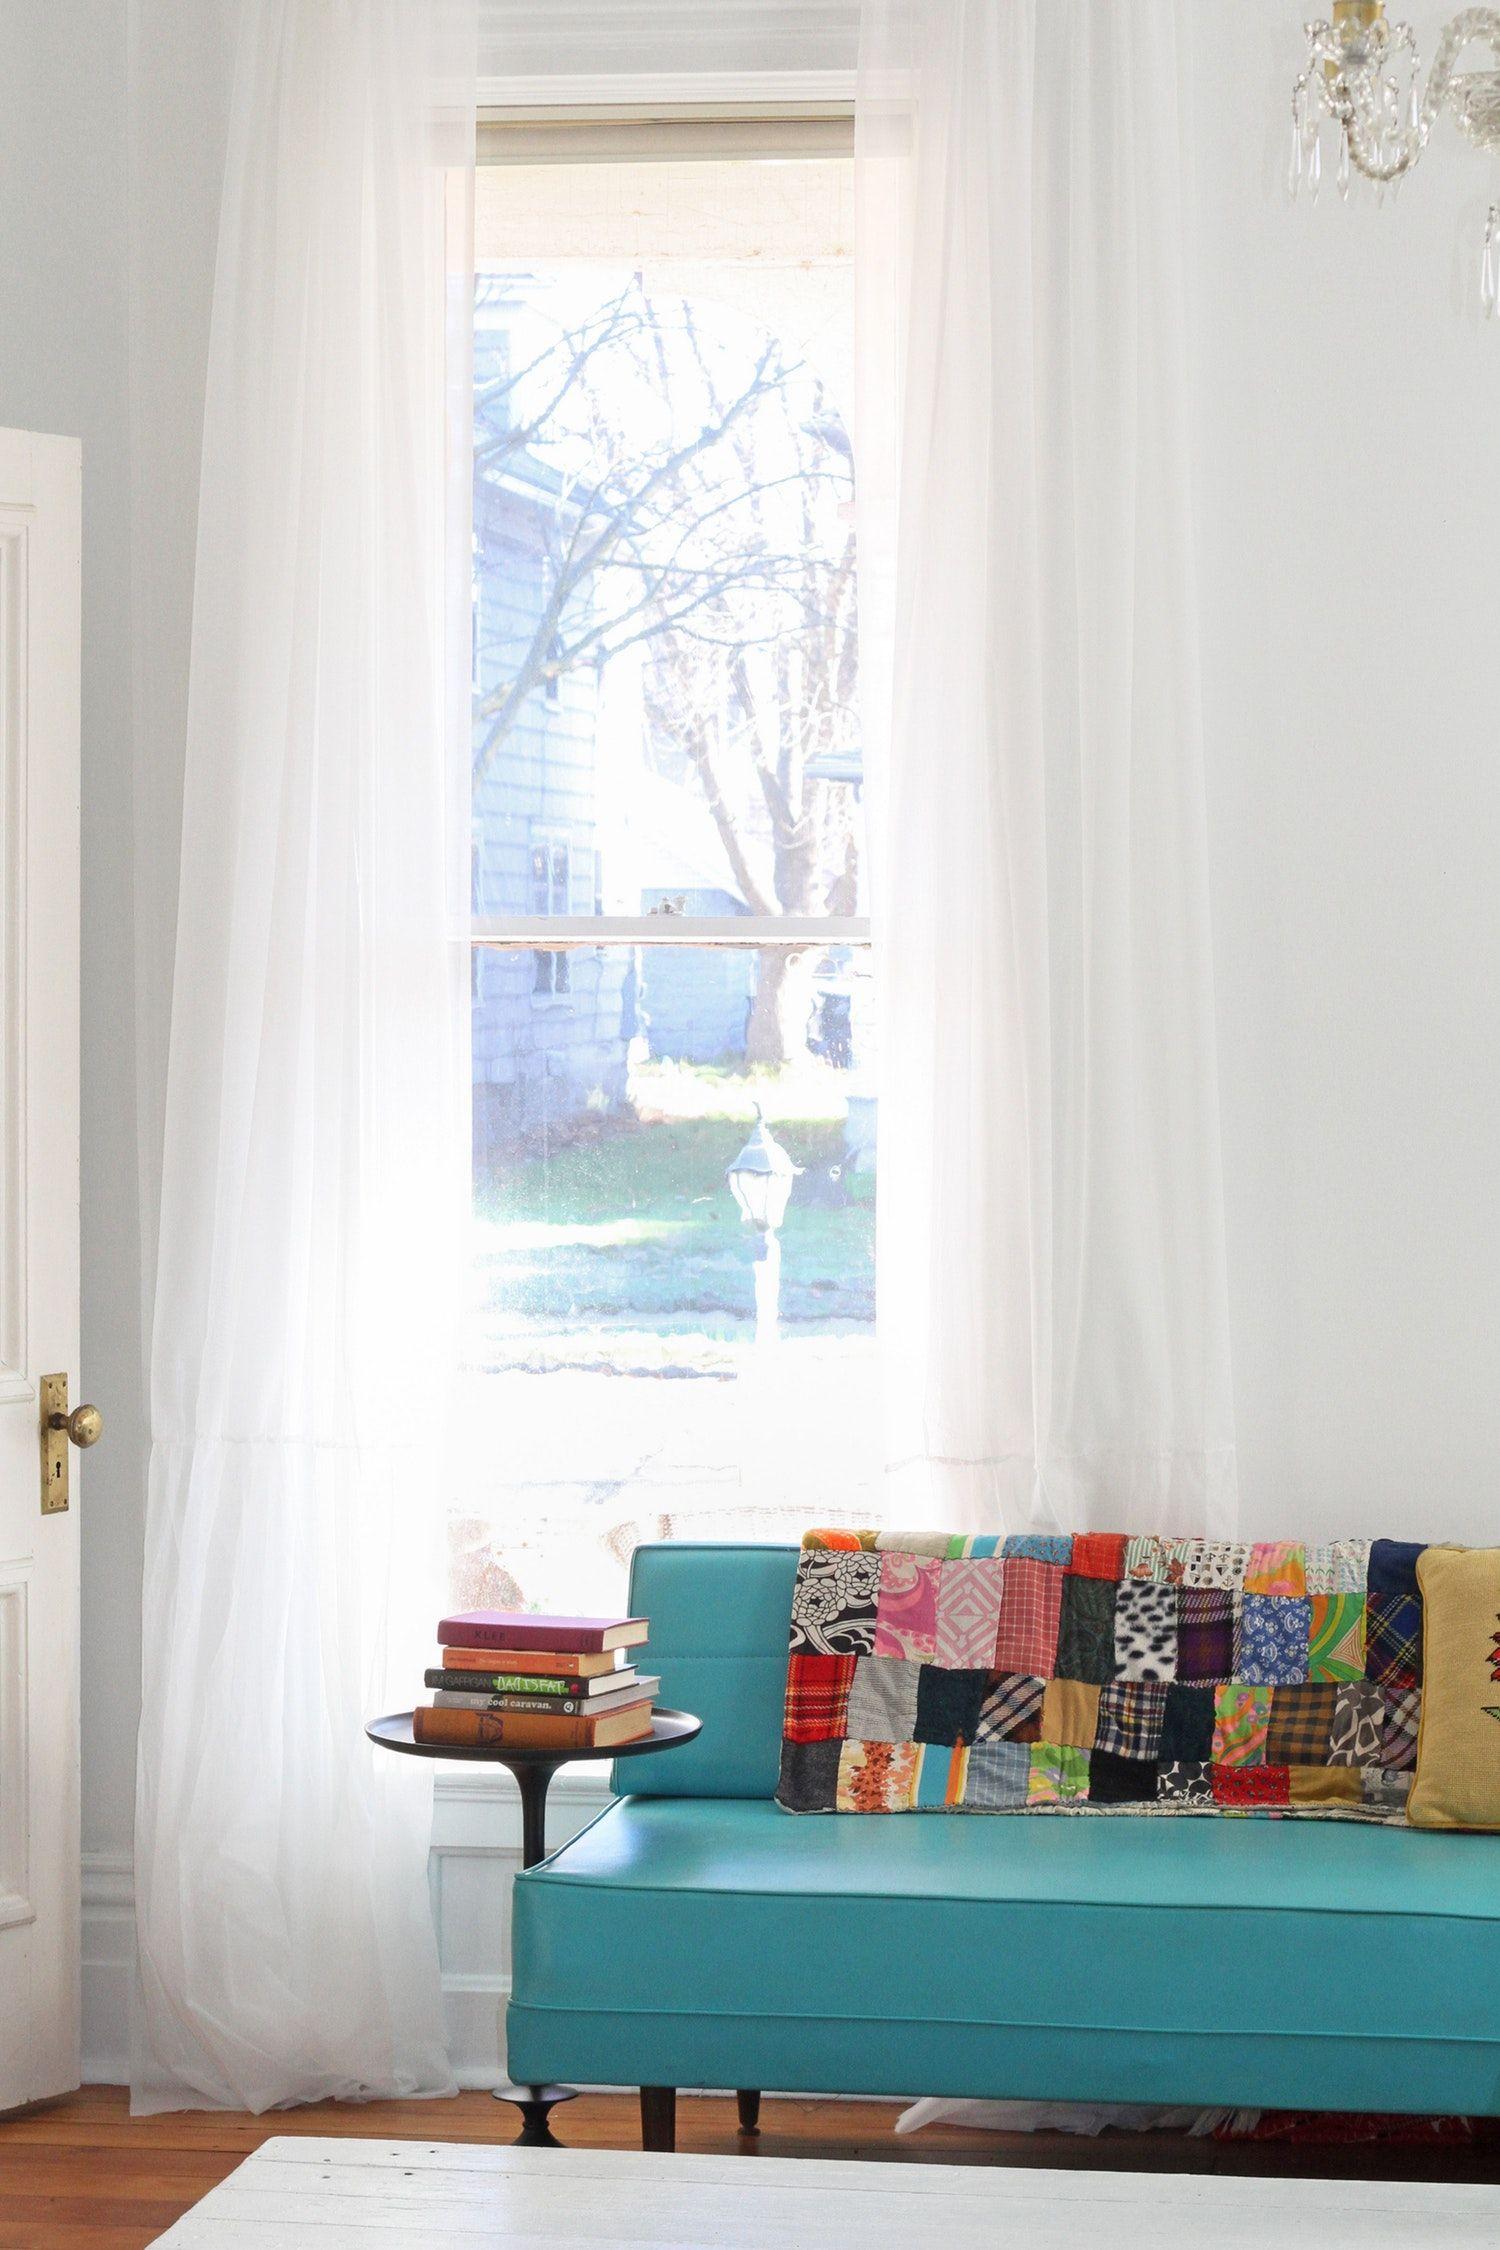 How To Install Window Insulation Film Home, Home decor